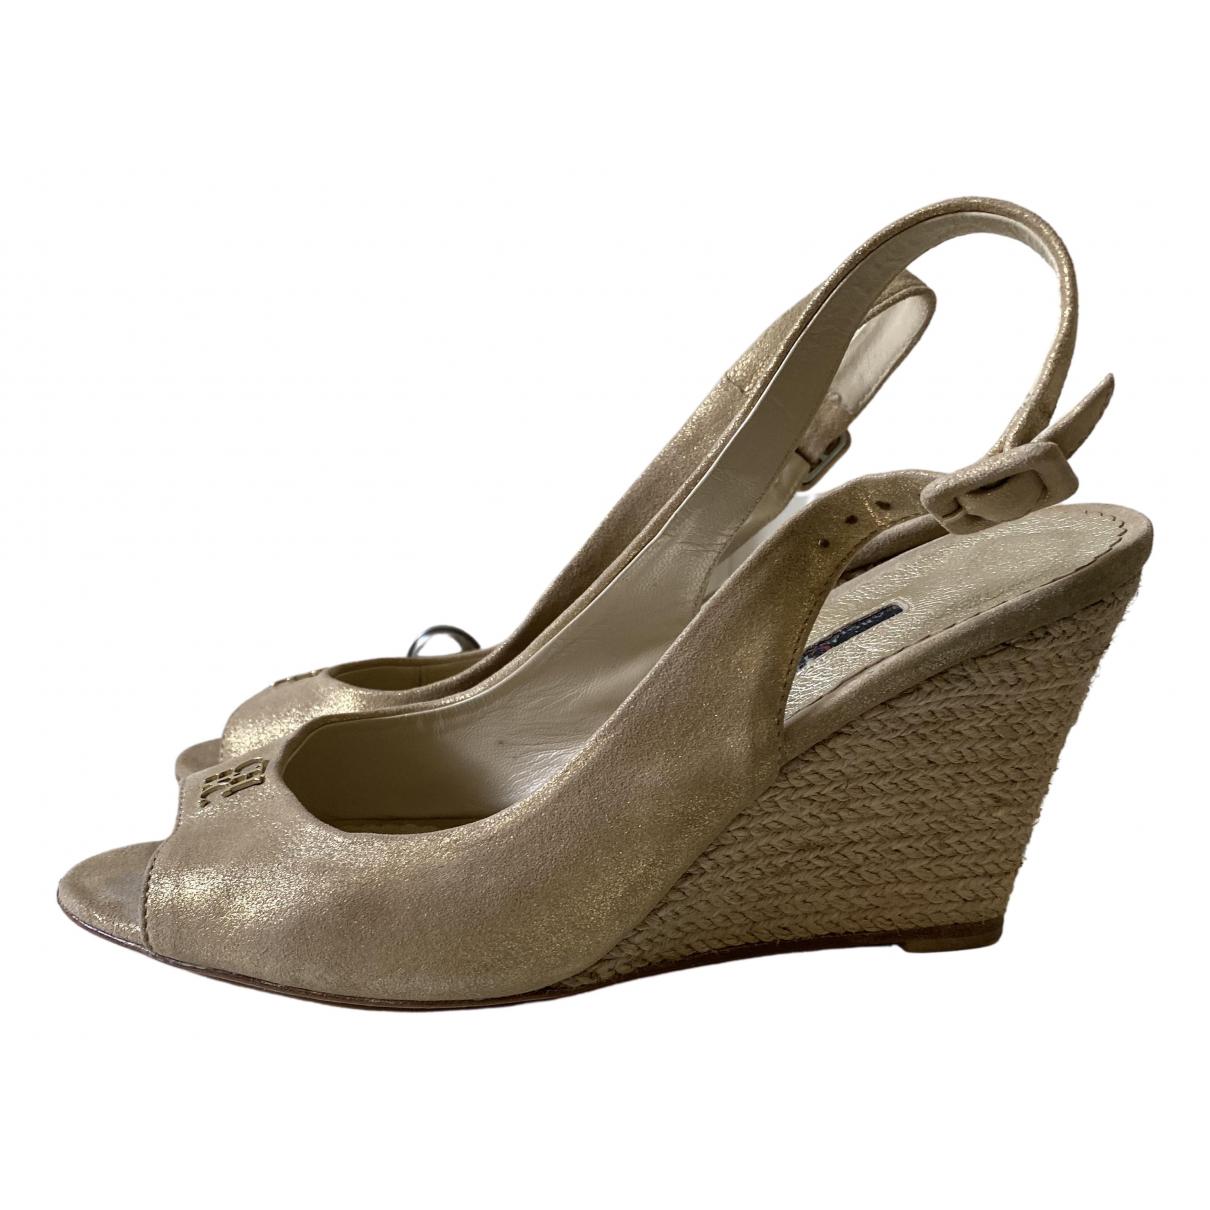 Carolina Herrera - Sandales   pour femme en cuir - dore